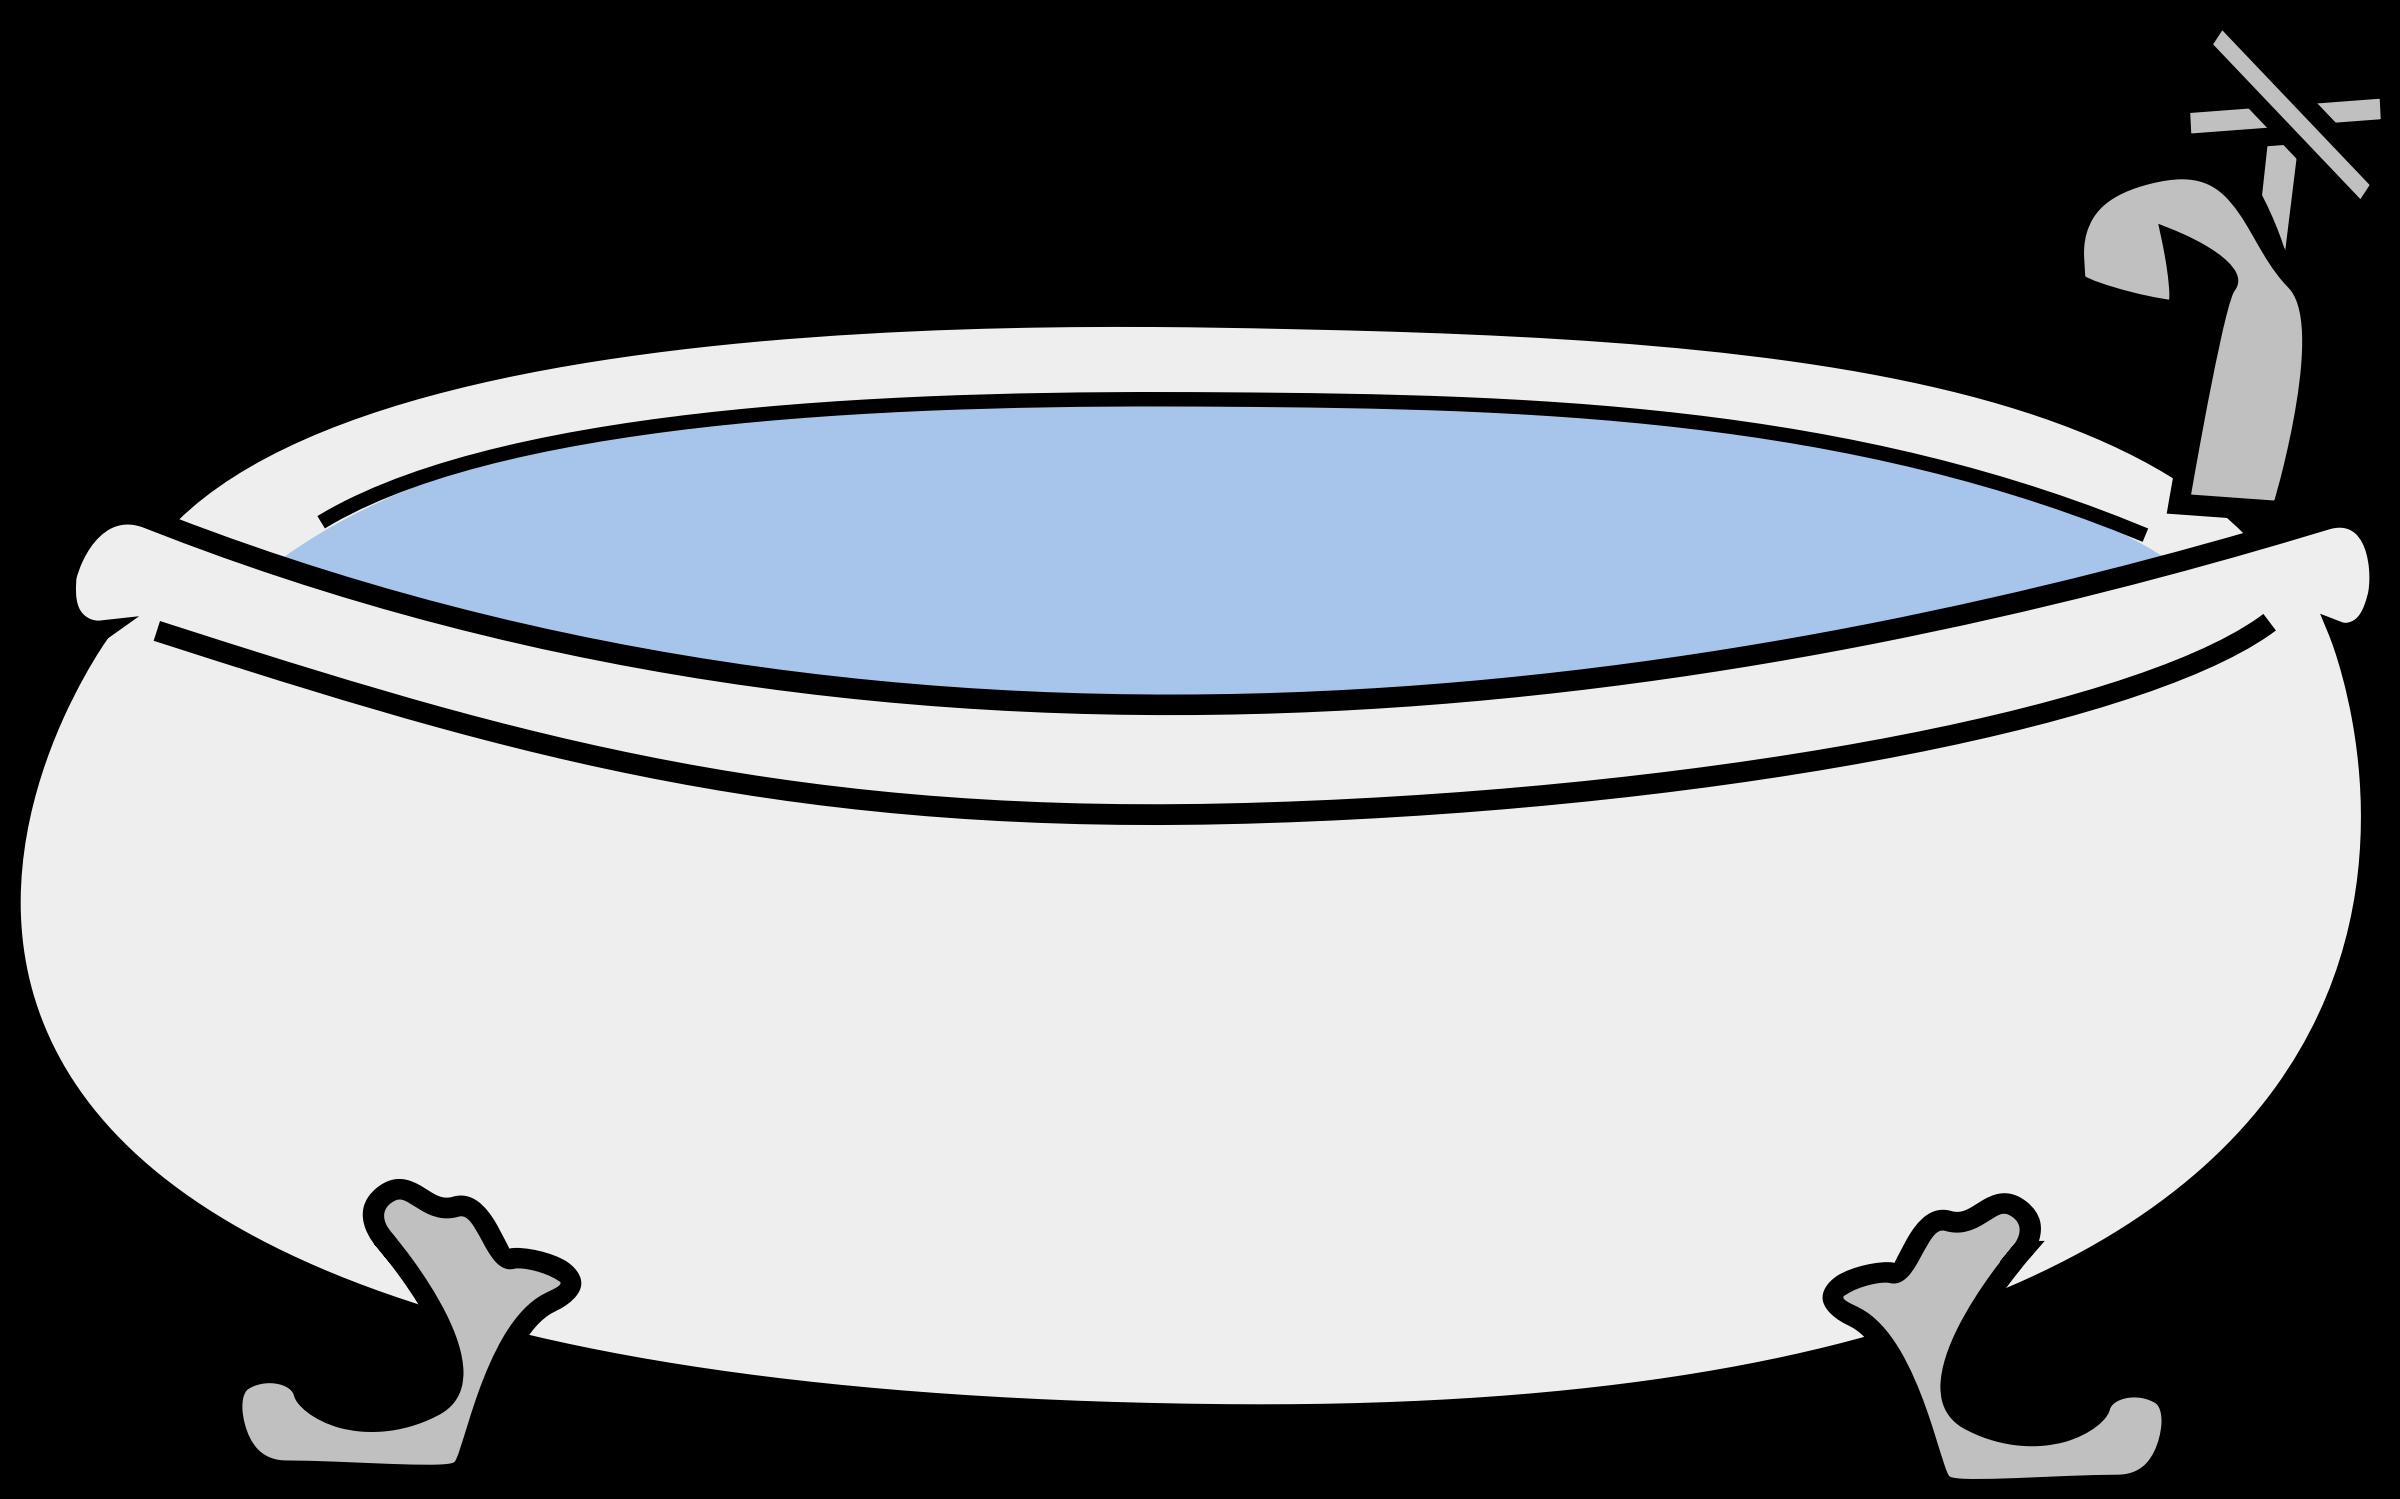 Evaporation clipart hot water. Bathtub ideas bath clip